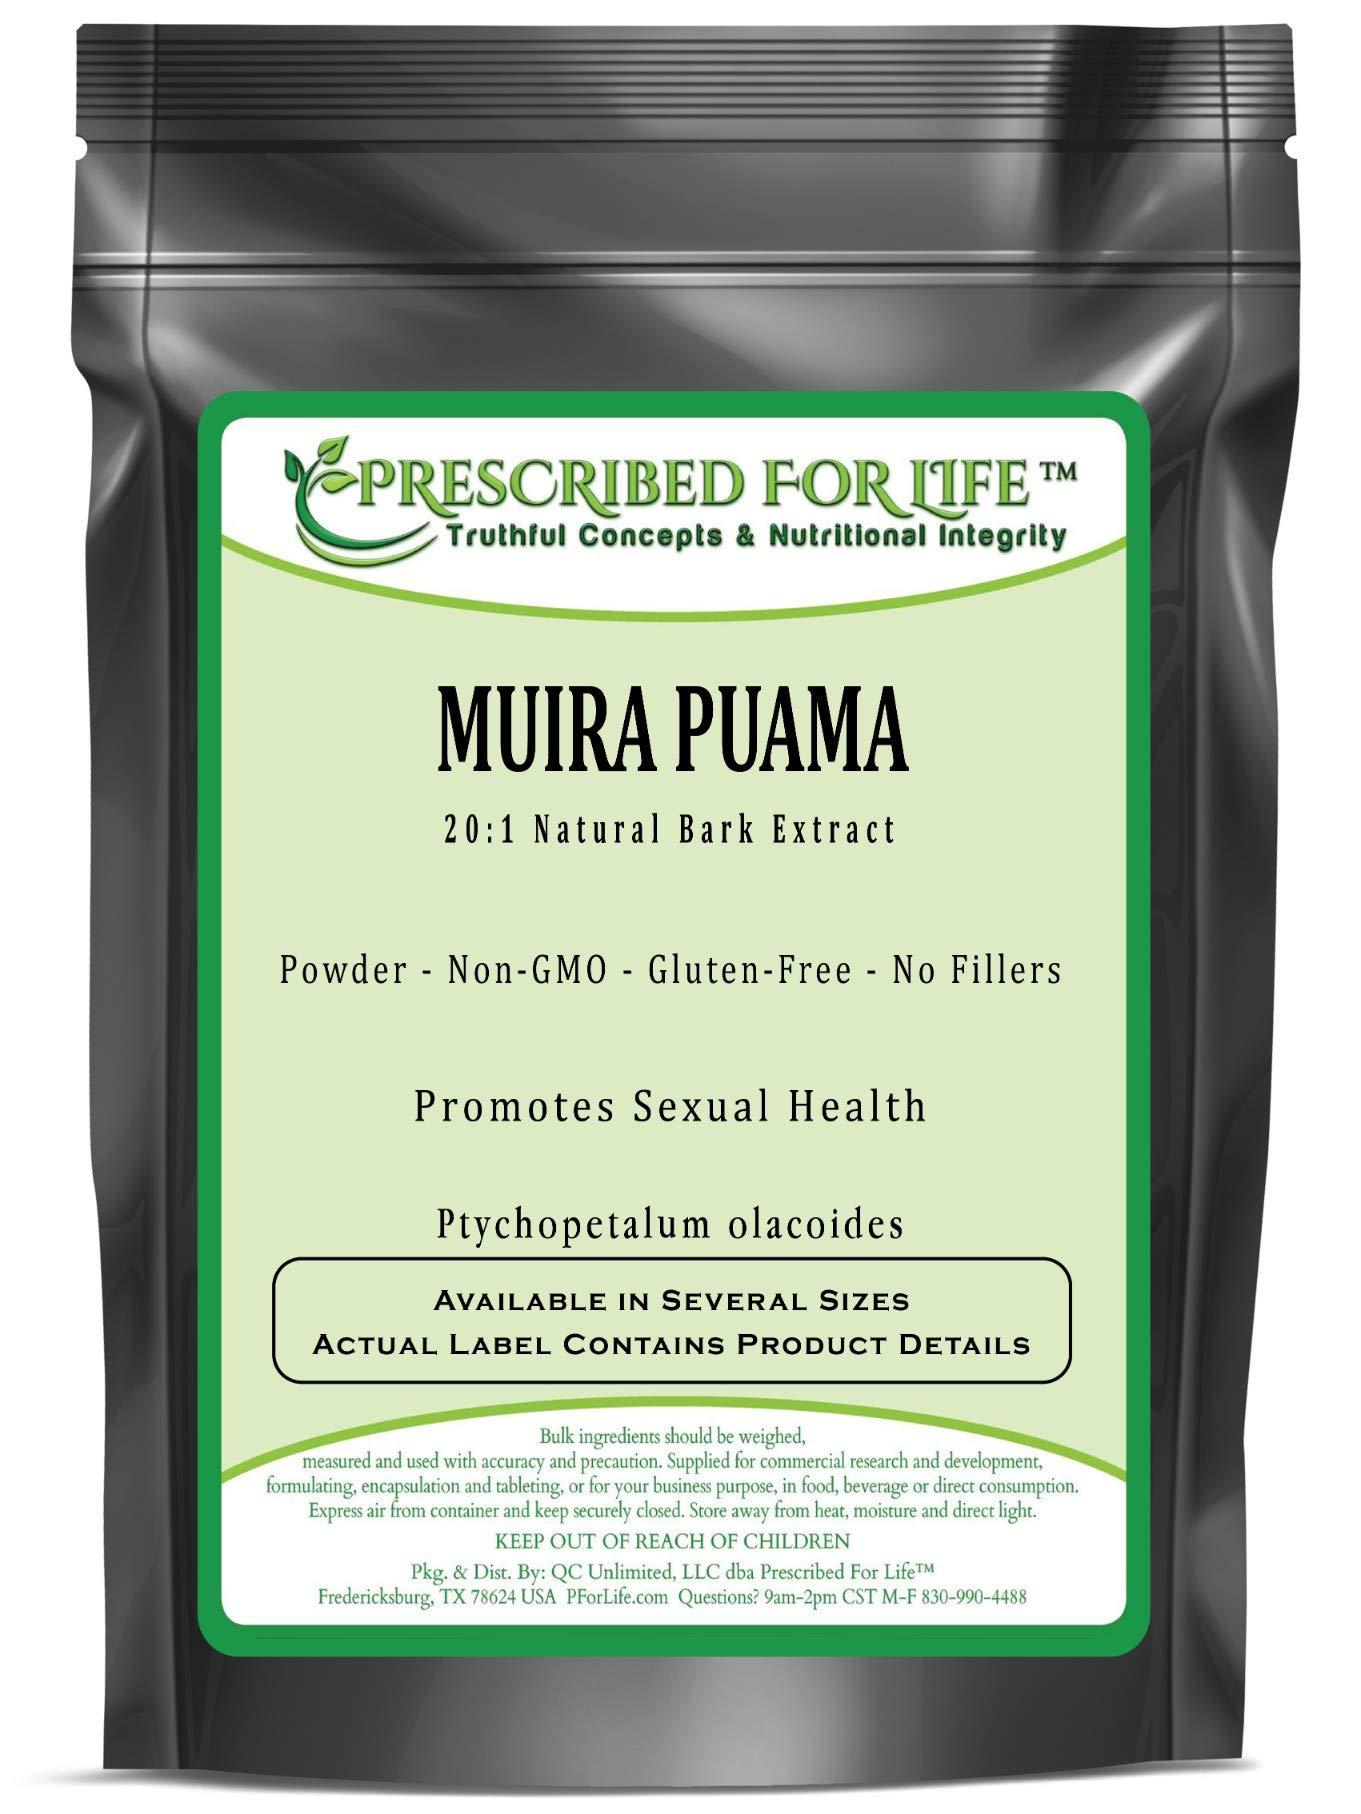 Muira Puama - 20:1 Natural Bark Powder Extract (Ptychopetalum olacoides), 5 kg